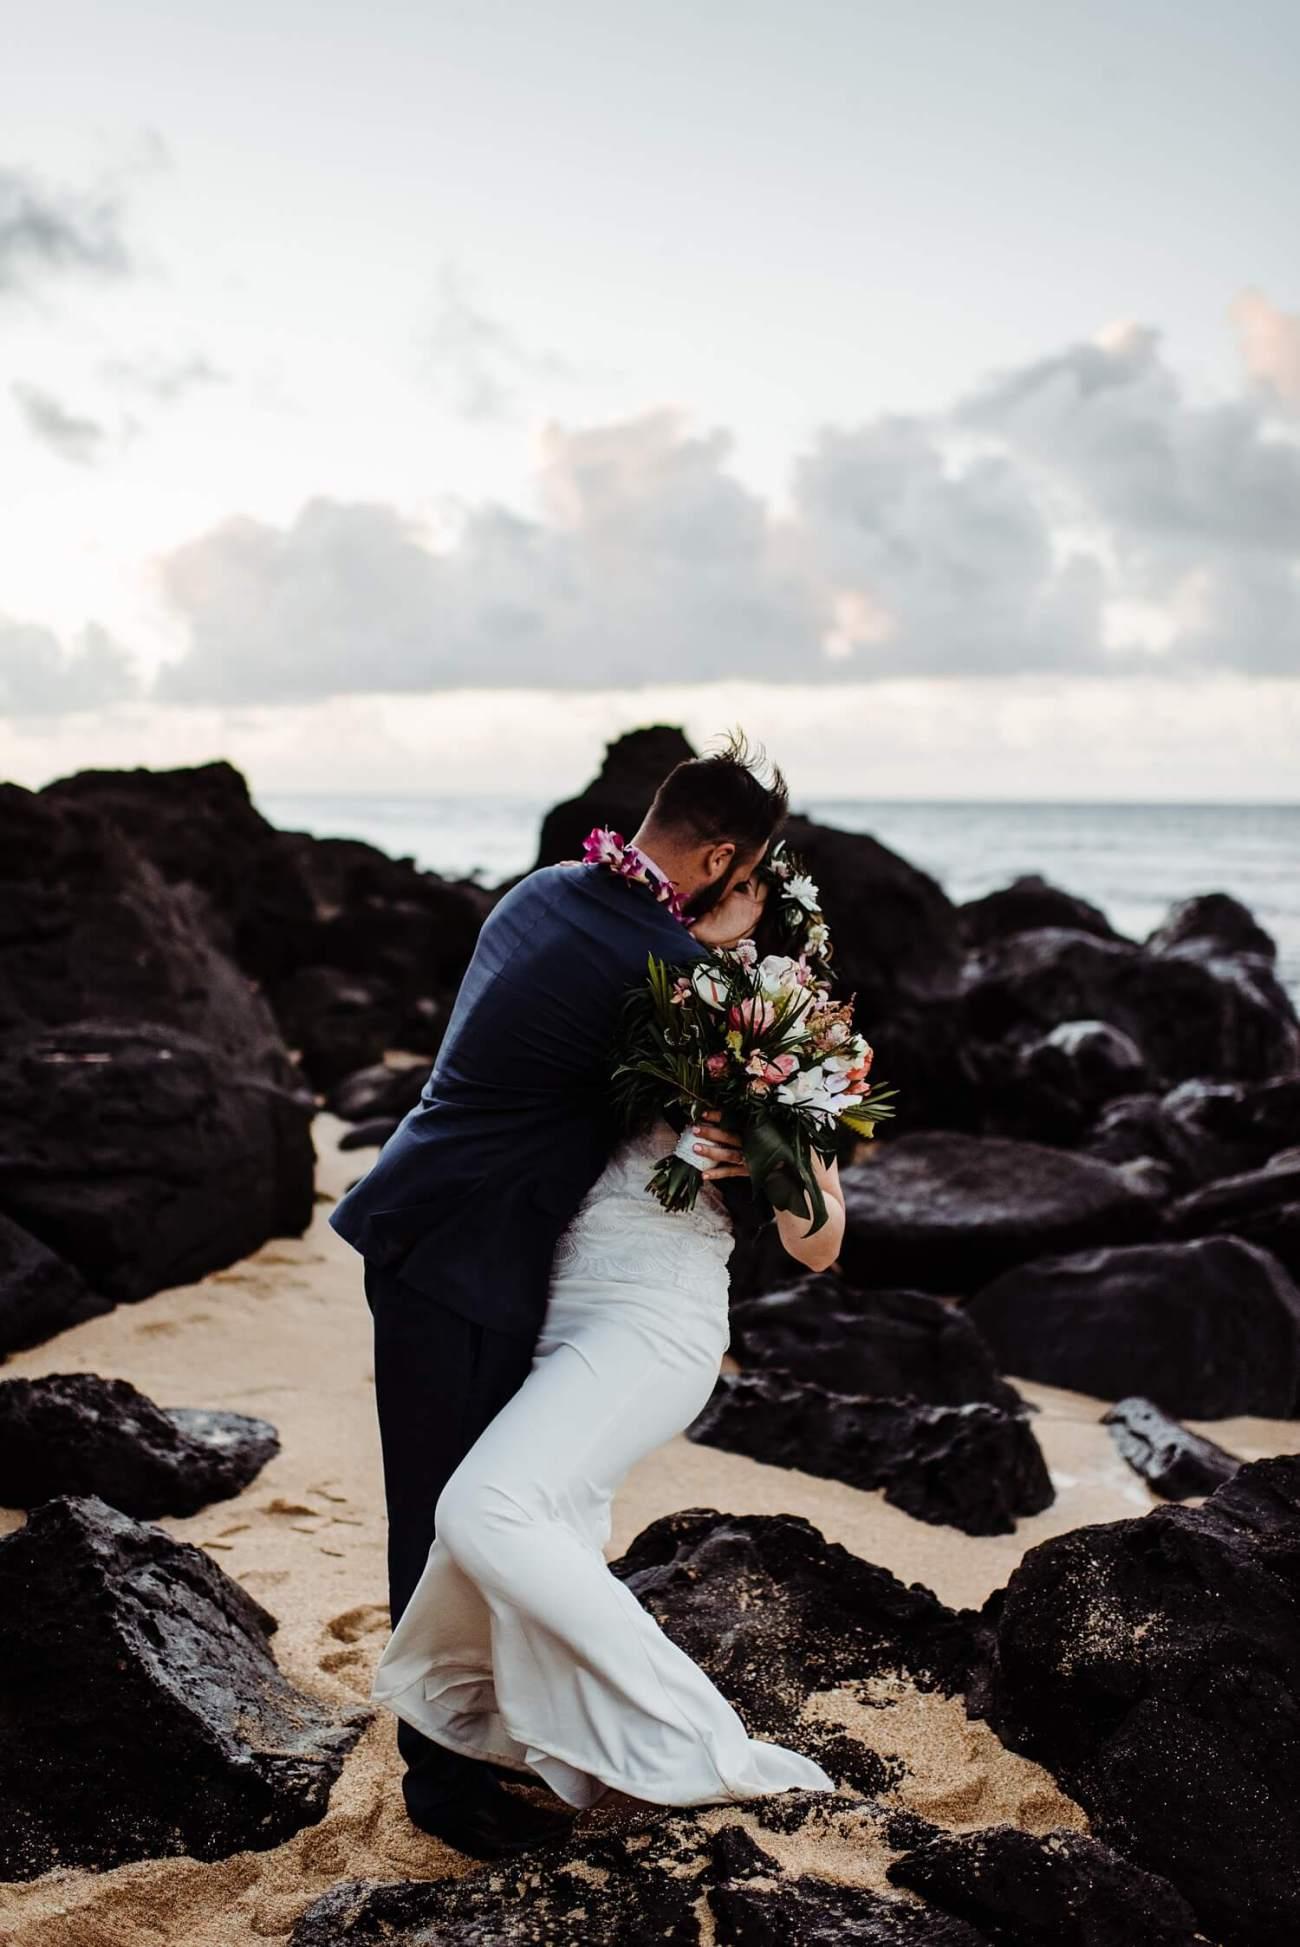 adventure elopement photographer,adventure elopements,adventure weddings,beach wedding,elope,elope on kauai,elopement,hawaii elopement,hawaii wedding,kauai,kauai elopement,kauai wedding,princeville wedding,